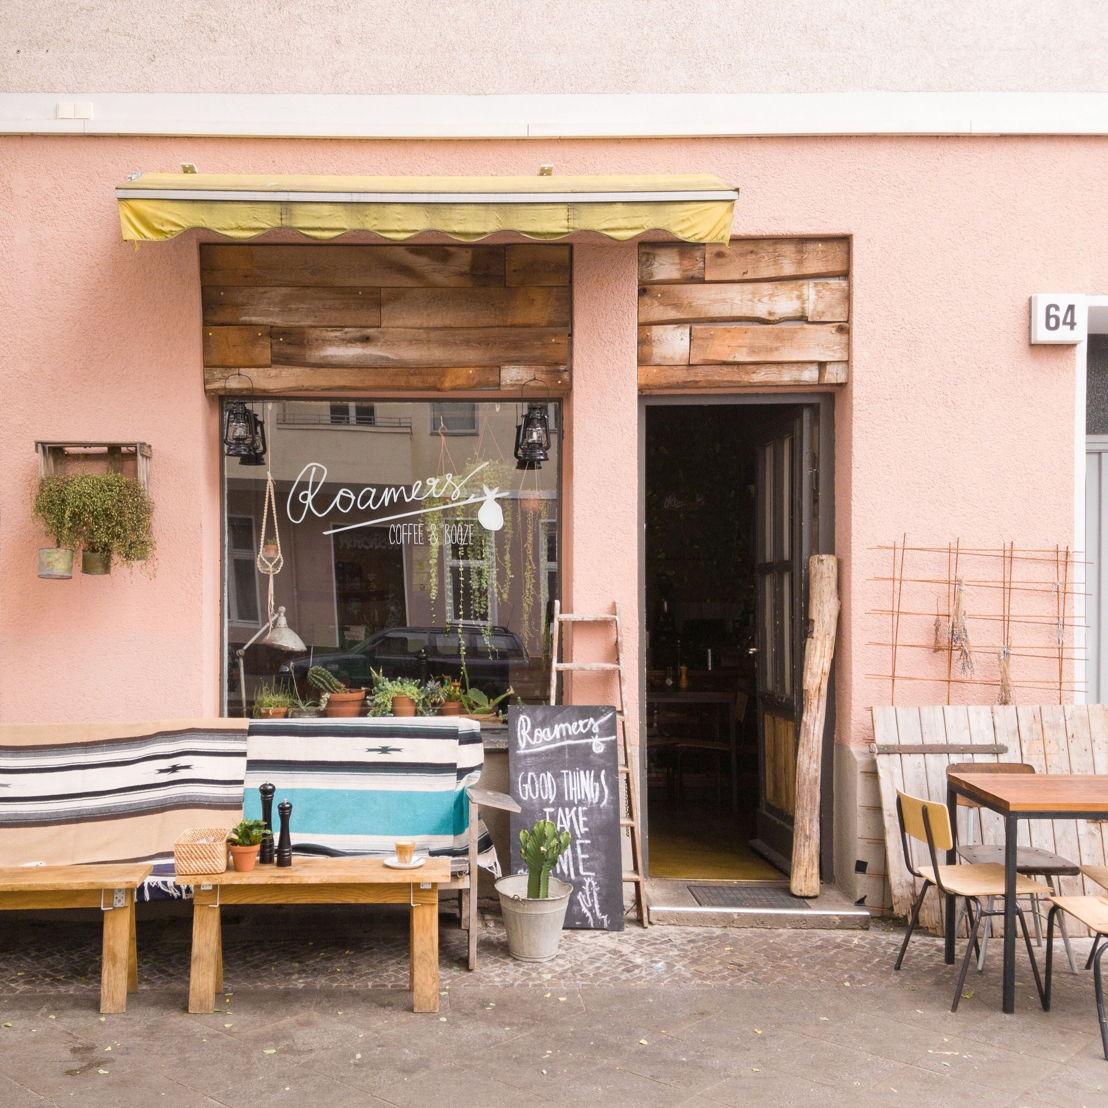 Café Roamer's (c) visitBerlin, Foto visumate